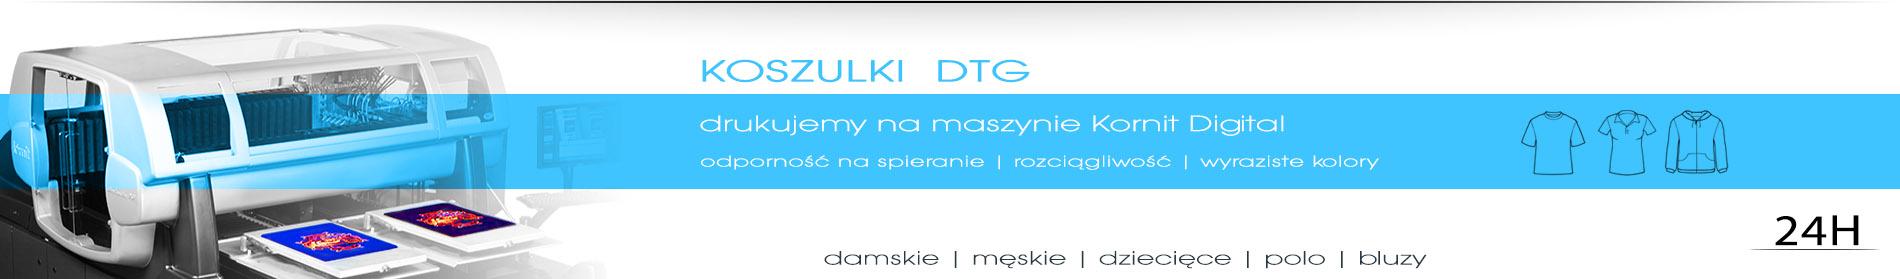 Drukarnia DGprint.pl drukujemy koszulki DTG